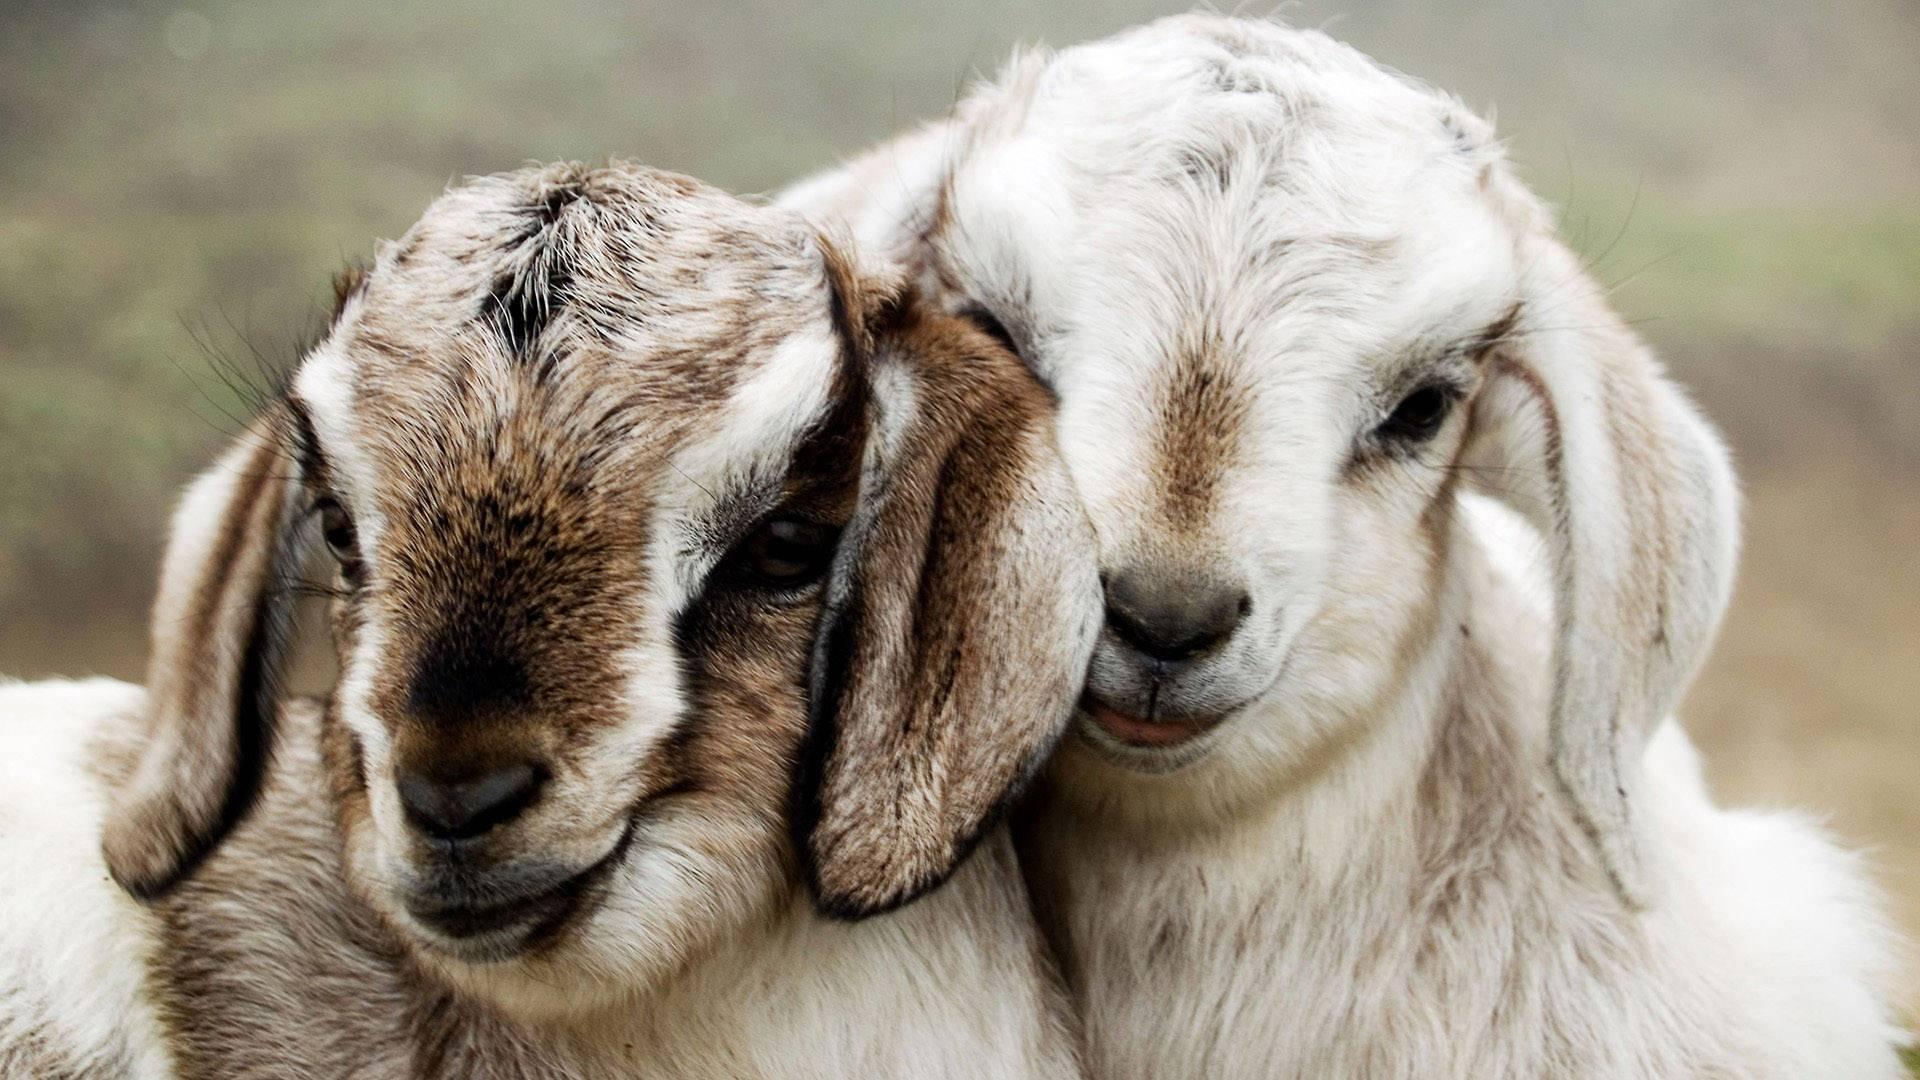 Cute lamb kids hd wallpaper